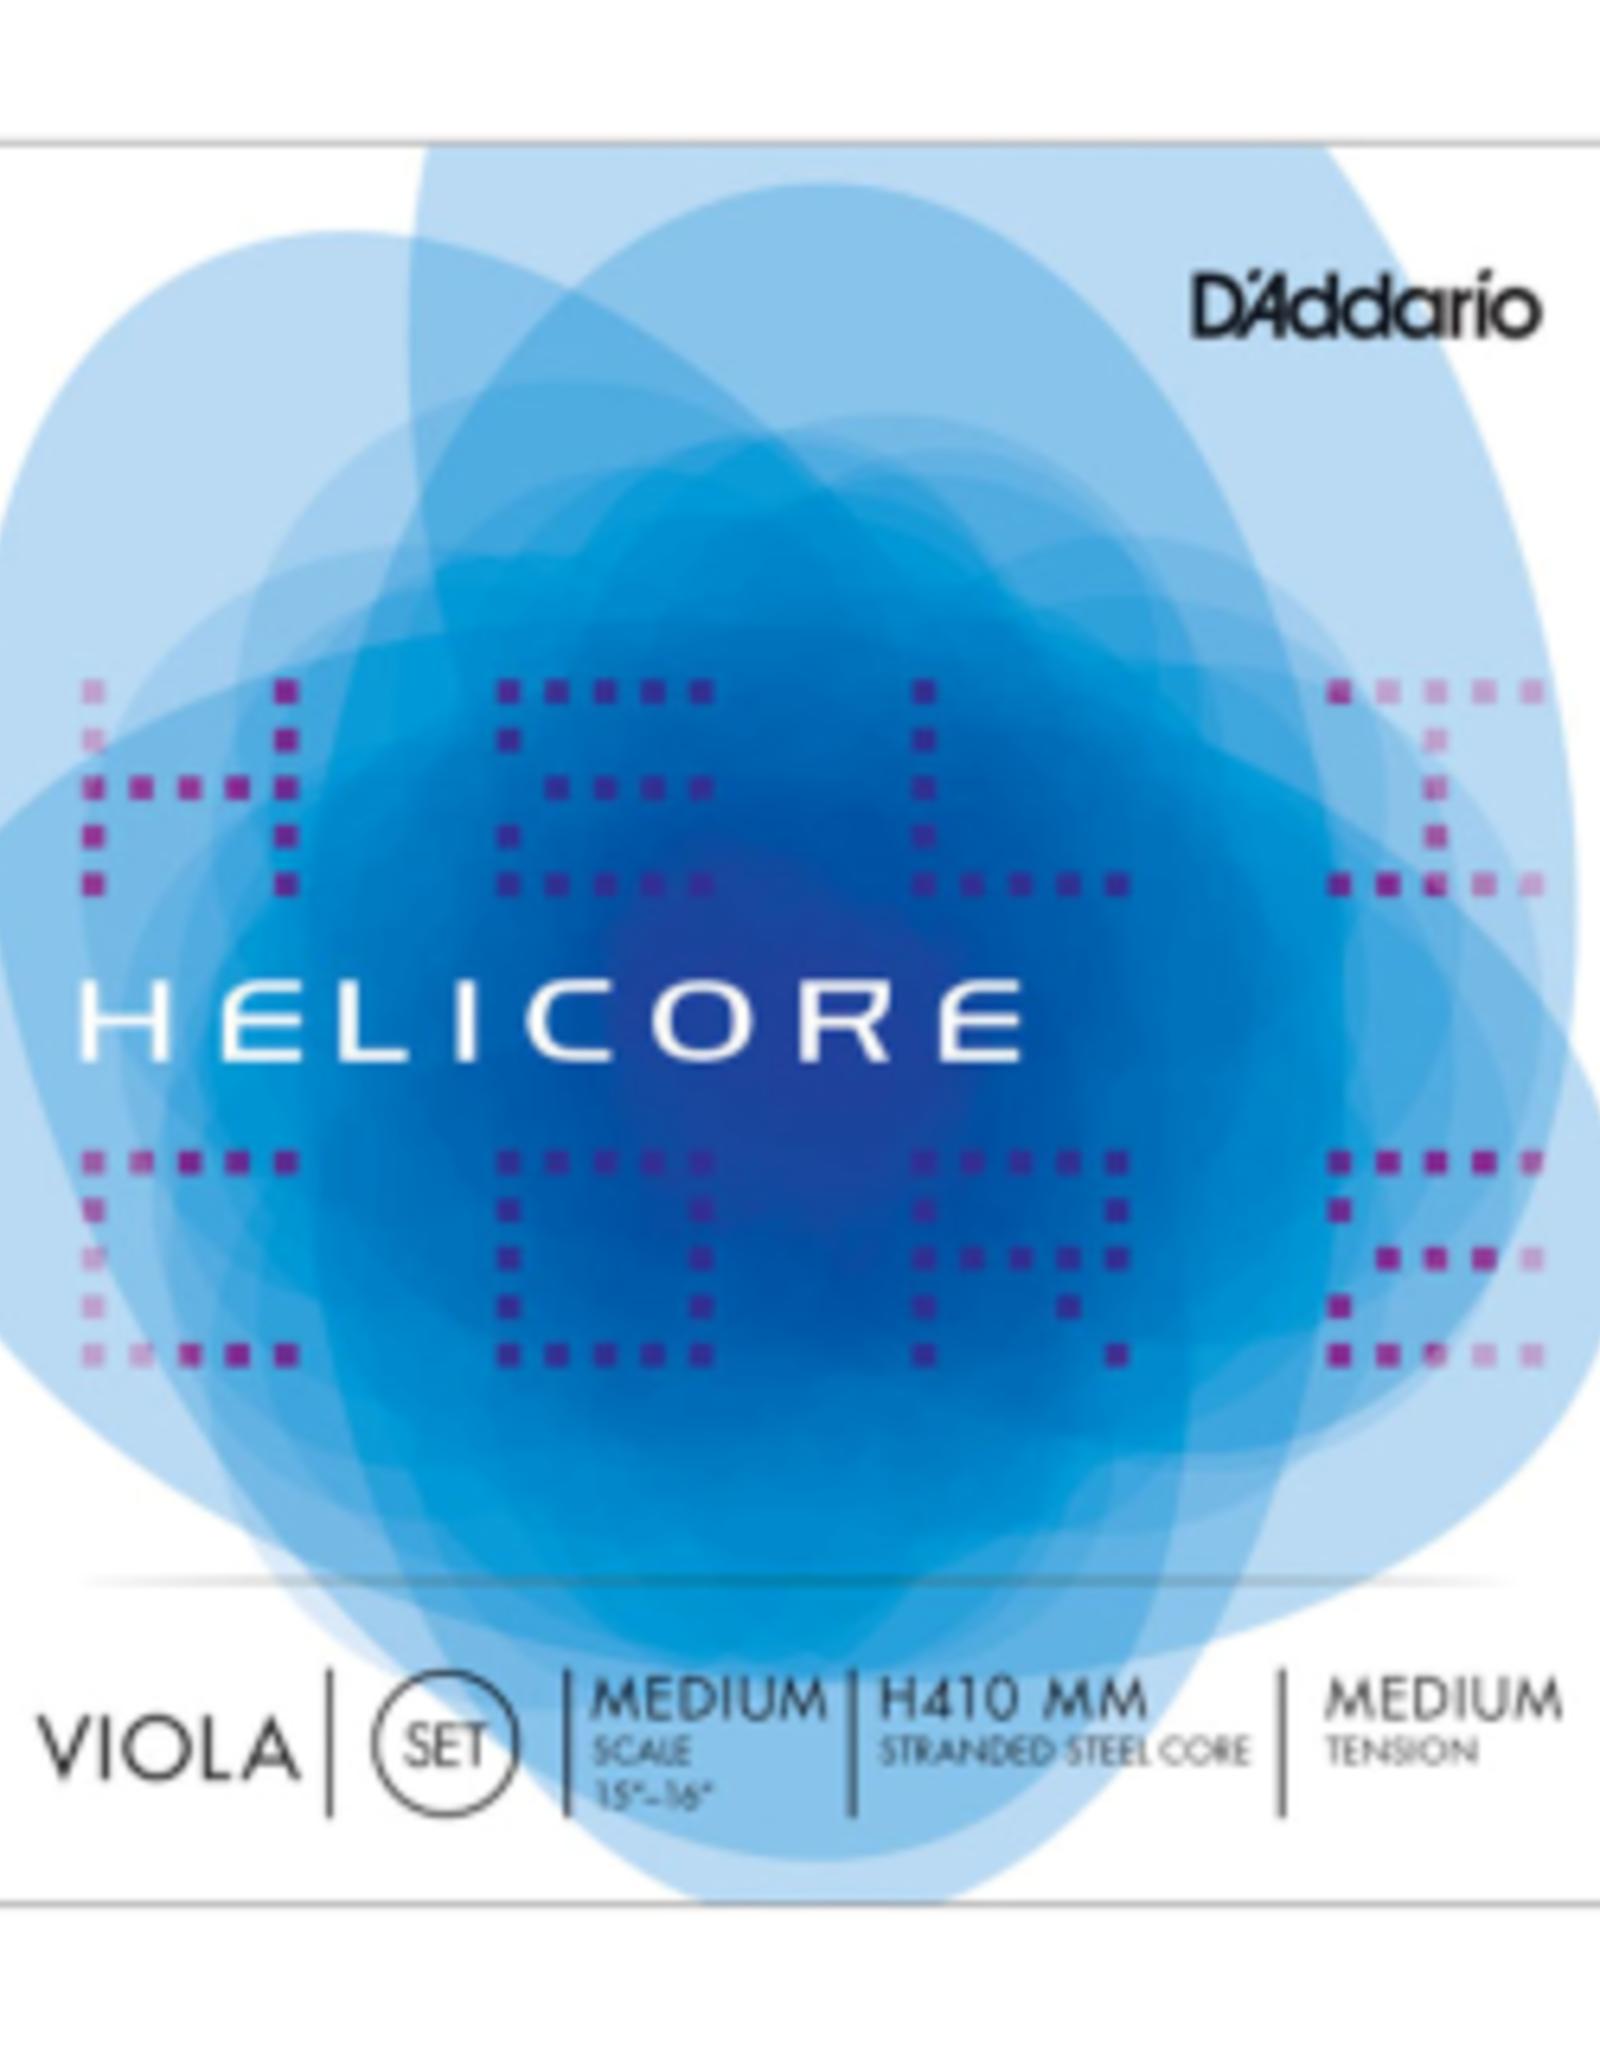 DADDARIO Helicore snaar voor altviool, sol (G-3) 15 -16 , medium, silver - art.